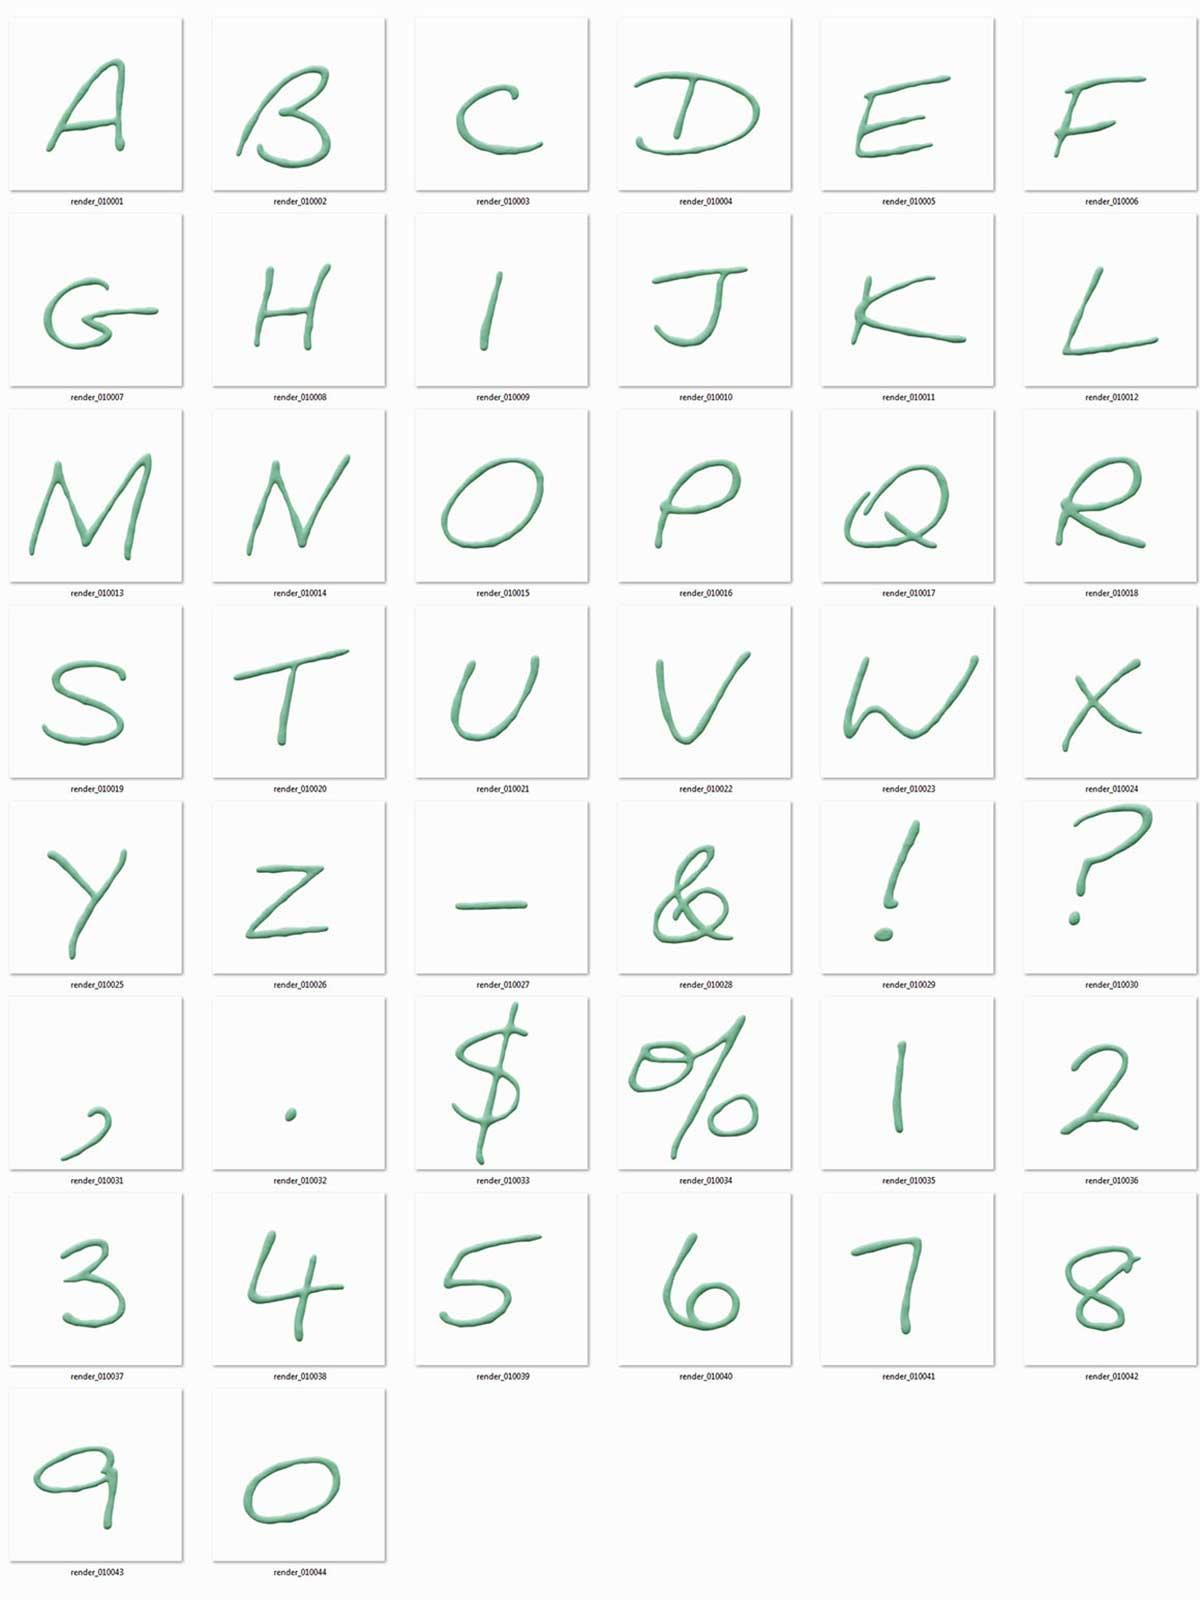 Thin Plasticine 3D Lettering